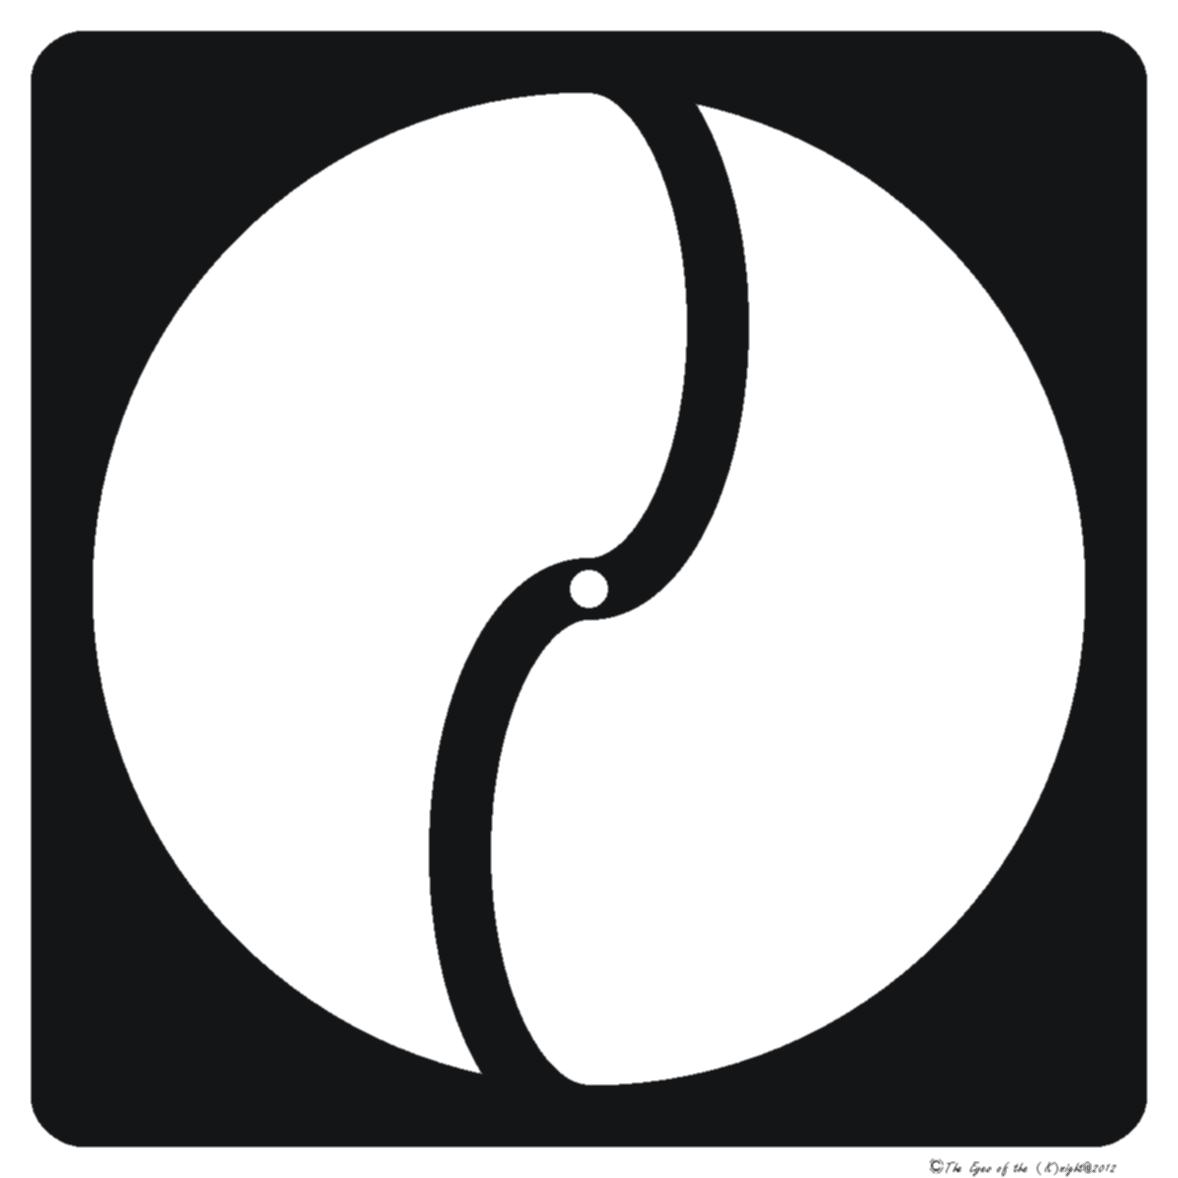 The eyes of the (K)night logo